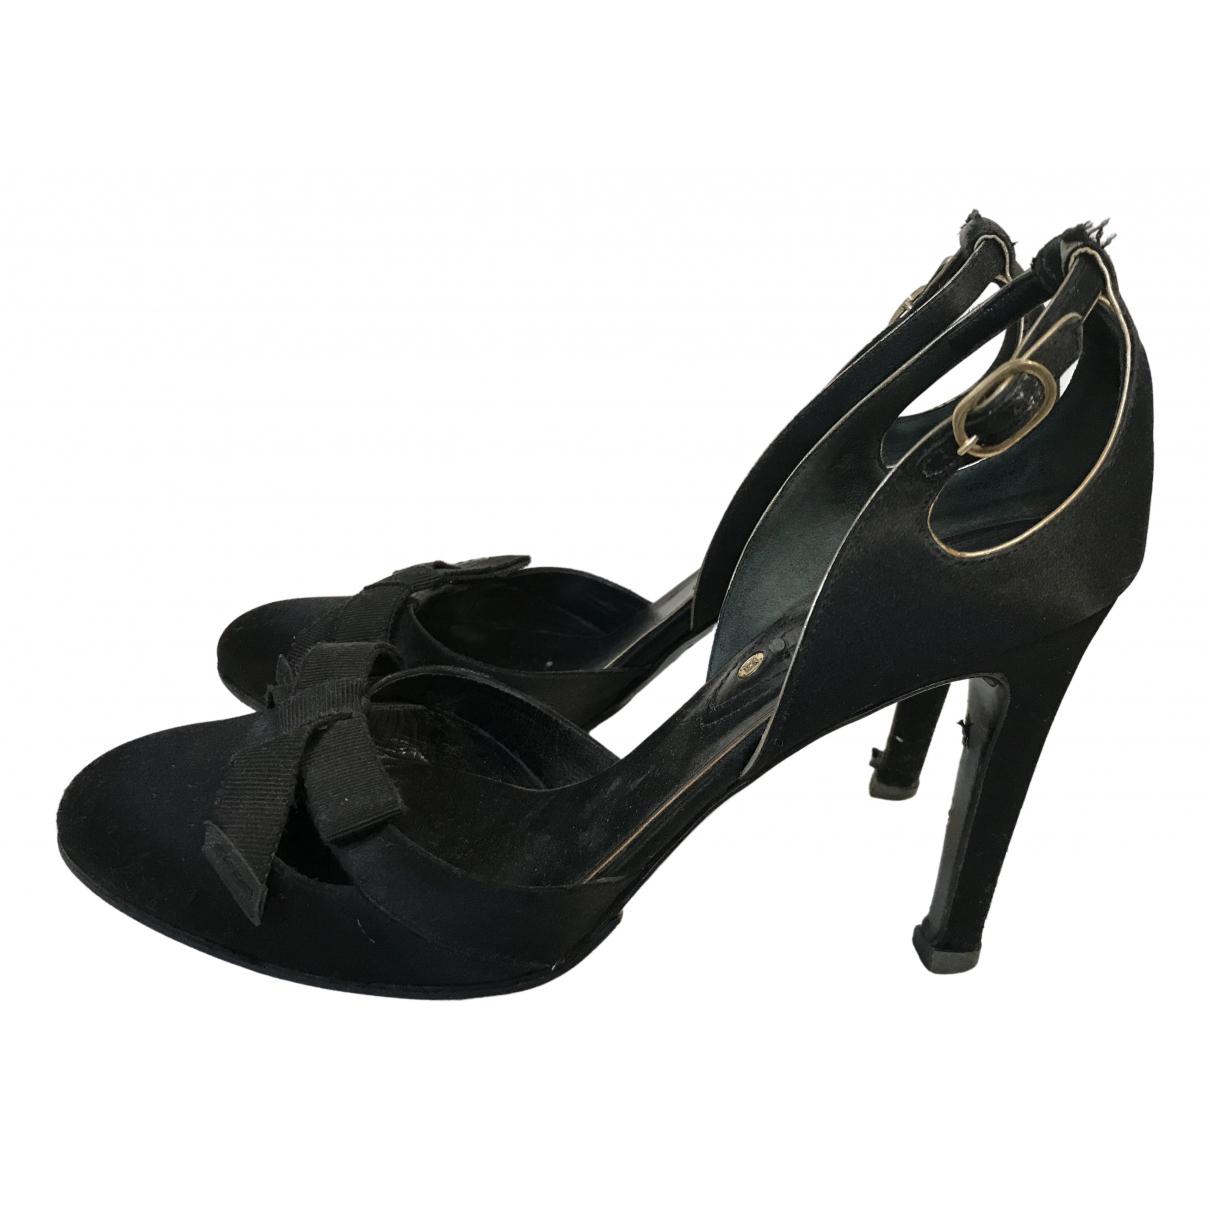 Celine \N Black Suede Heels for Women 36.5 EU